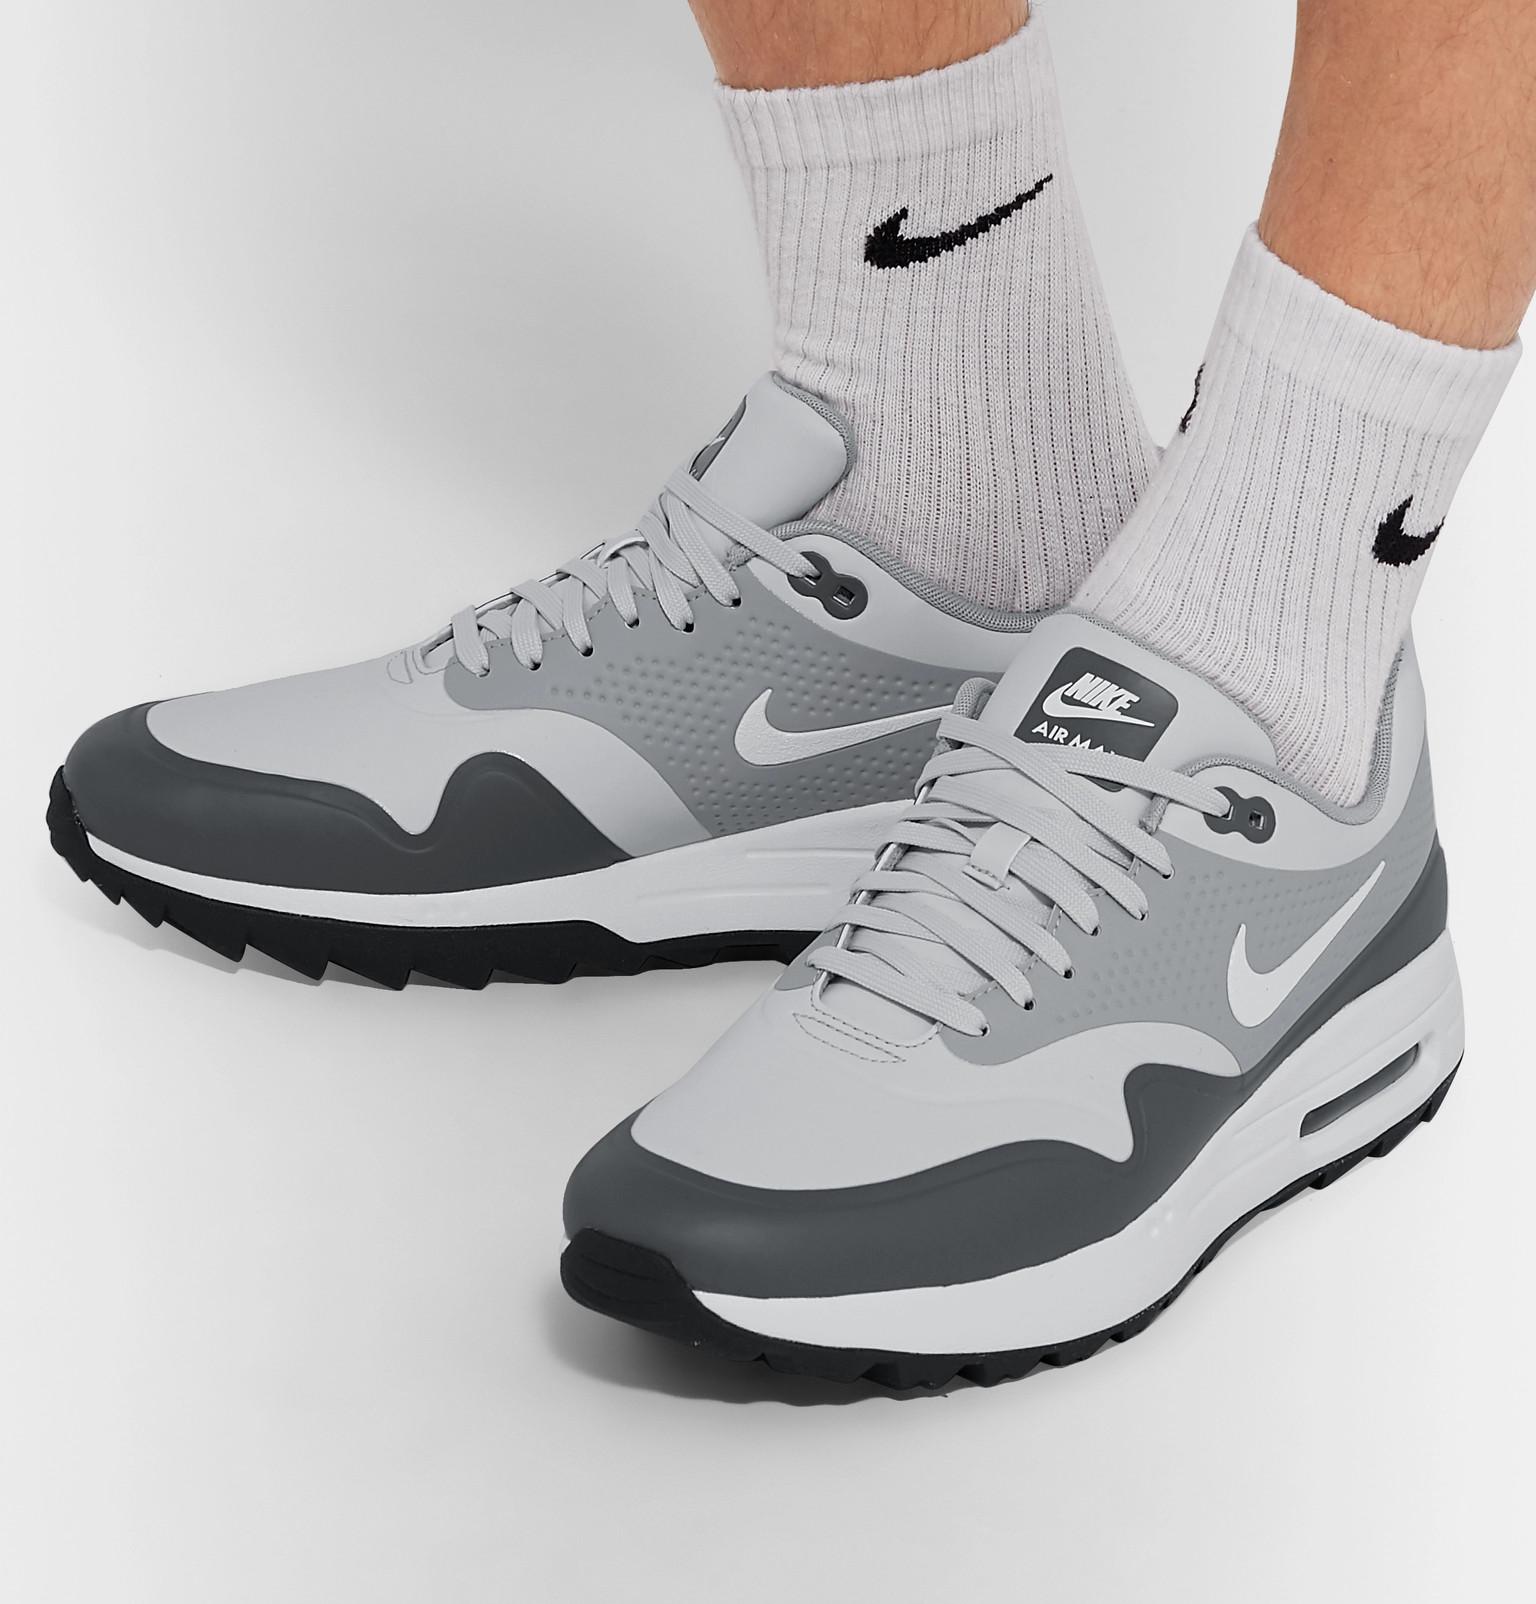 huge discount c9a8c 5ef04 Nike GolfAir Max 1G Coated-Mesh Golf Shoes